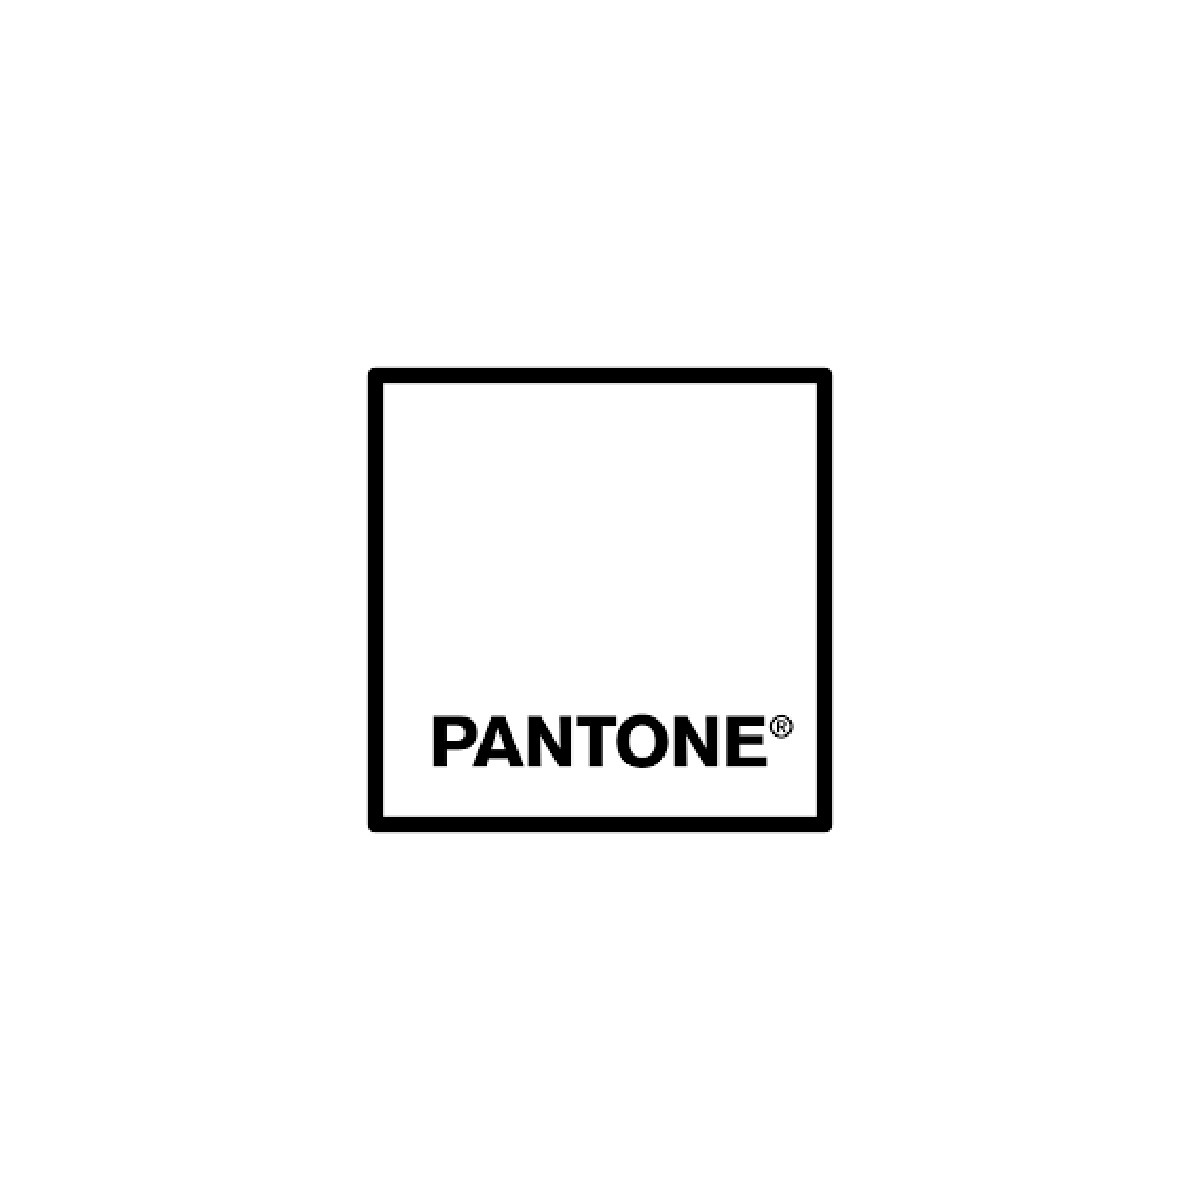 PANTONE KARTA ZA PREMAZNE/NEPREMAZNE PAPIRE